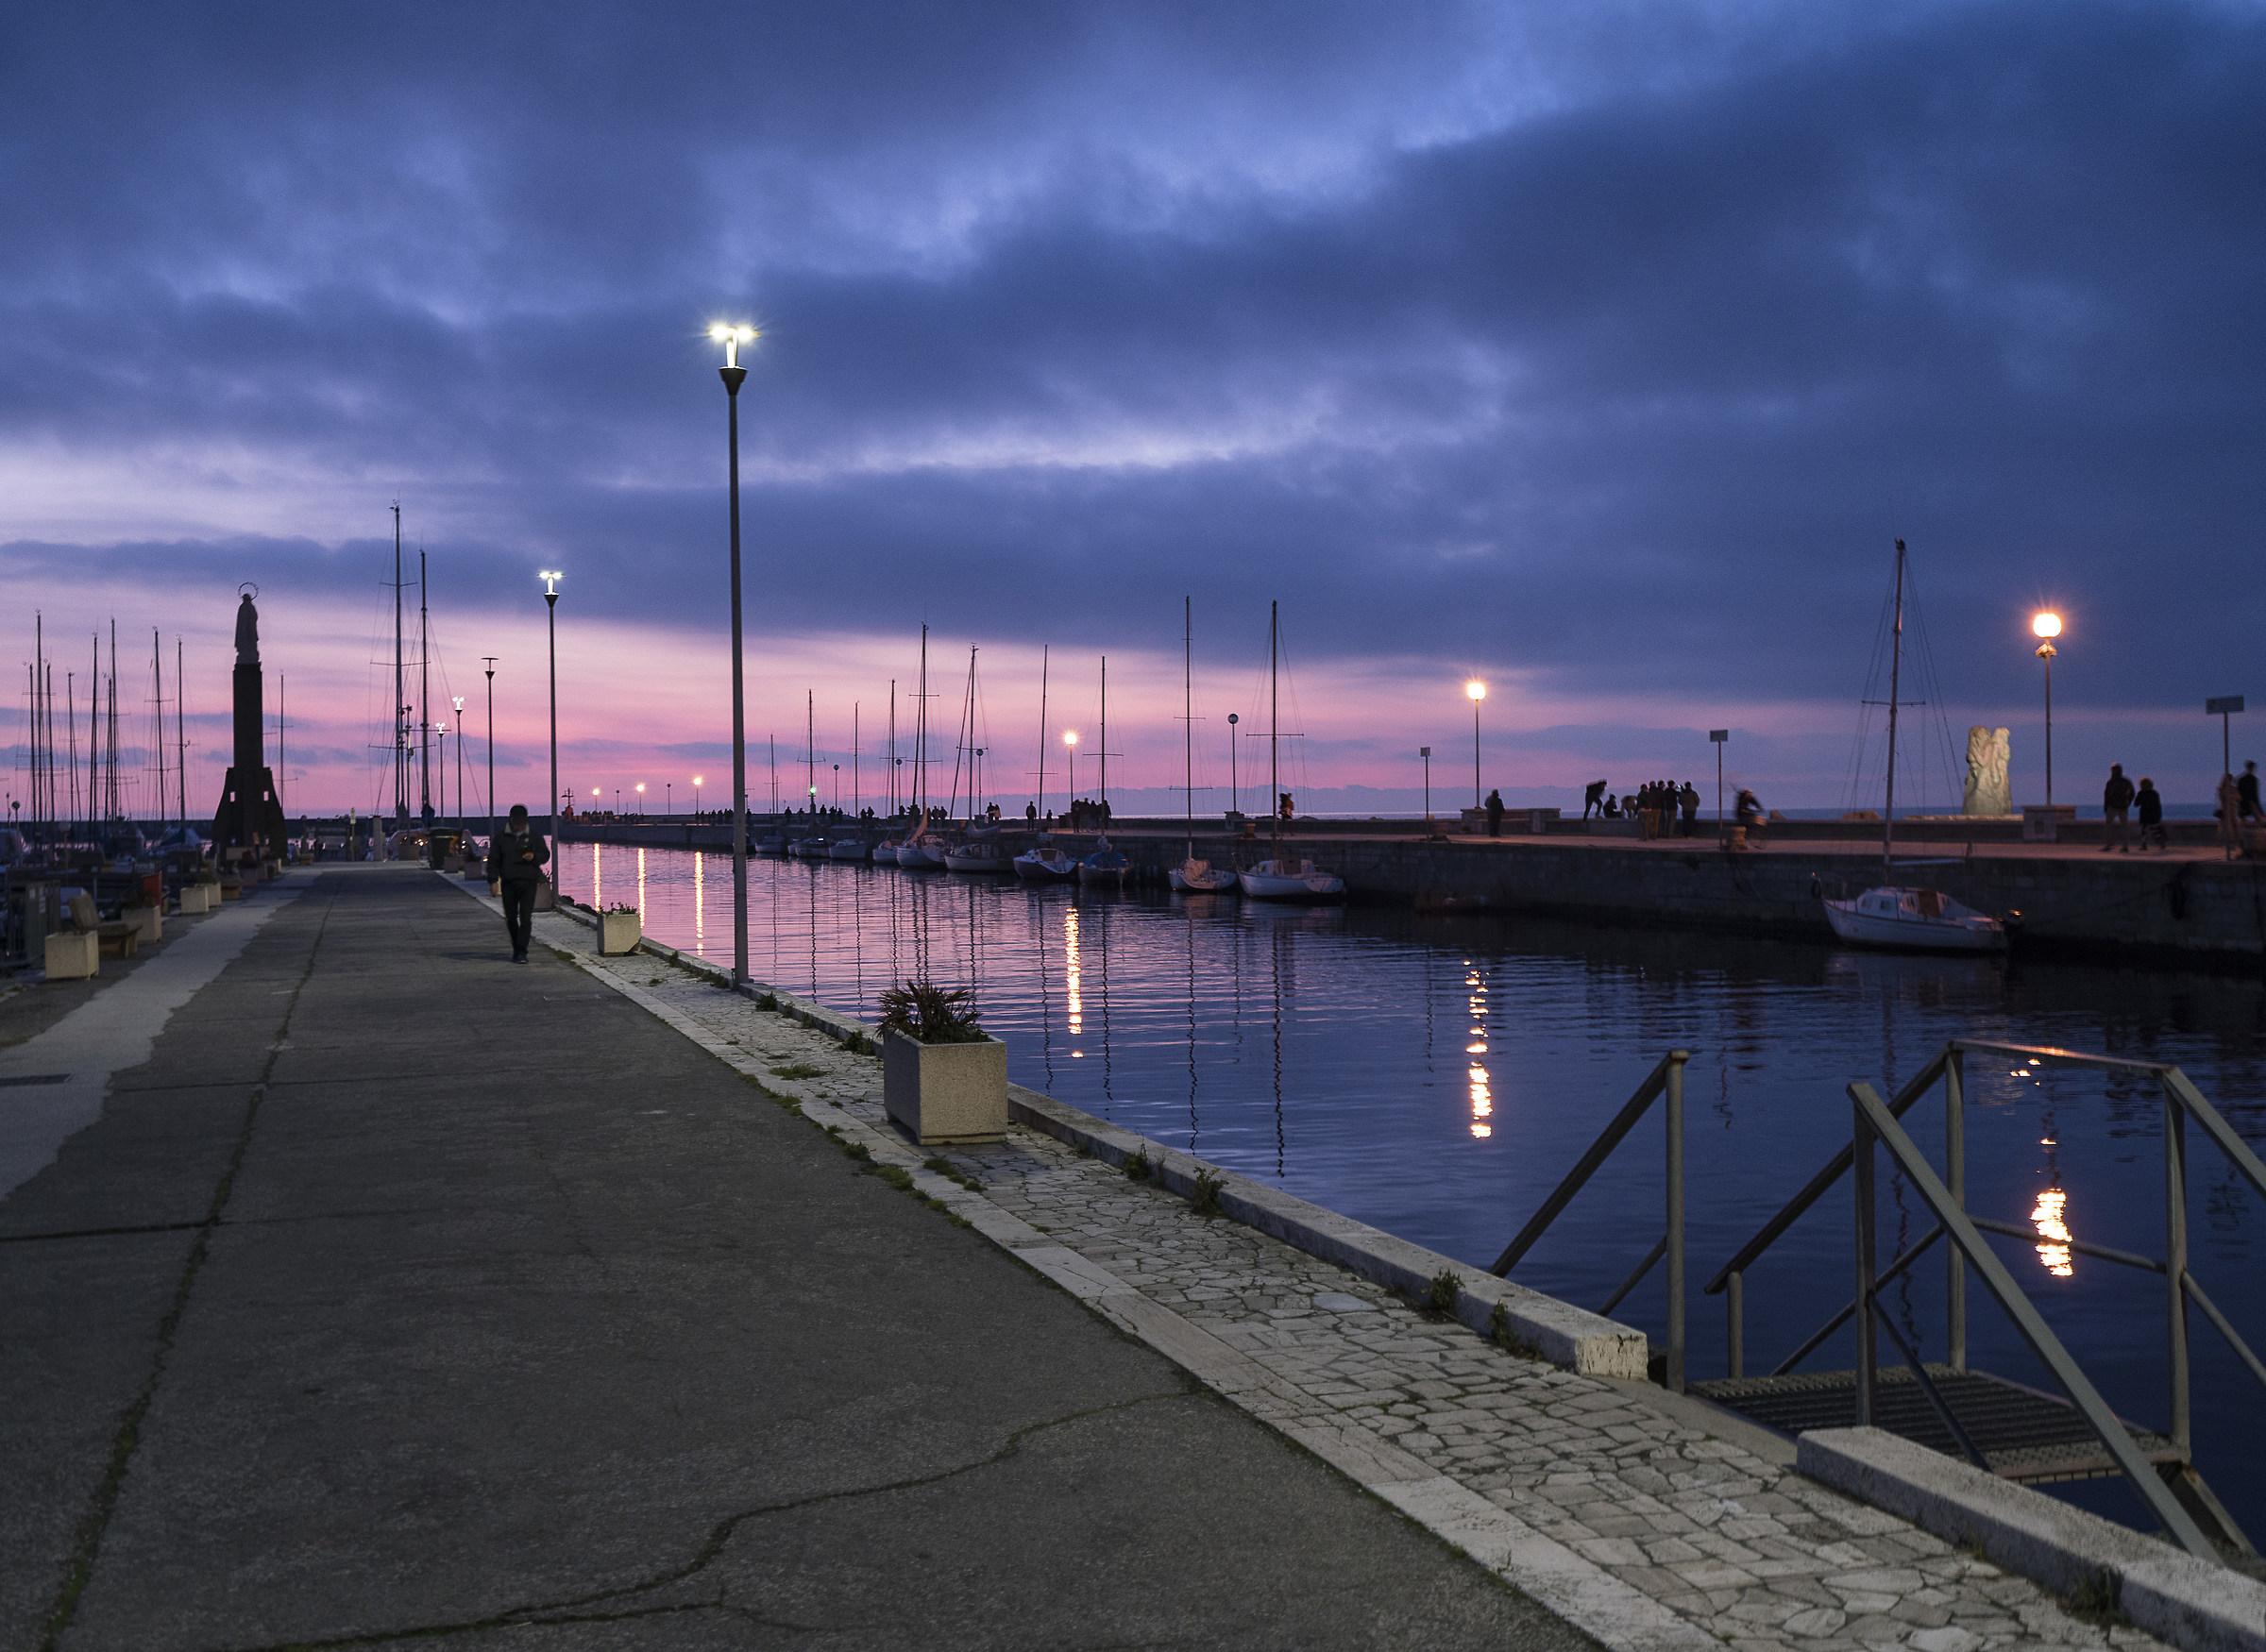 The evening walk...